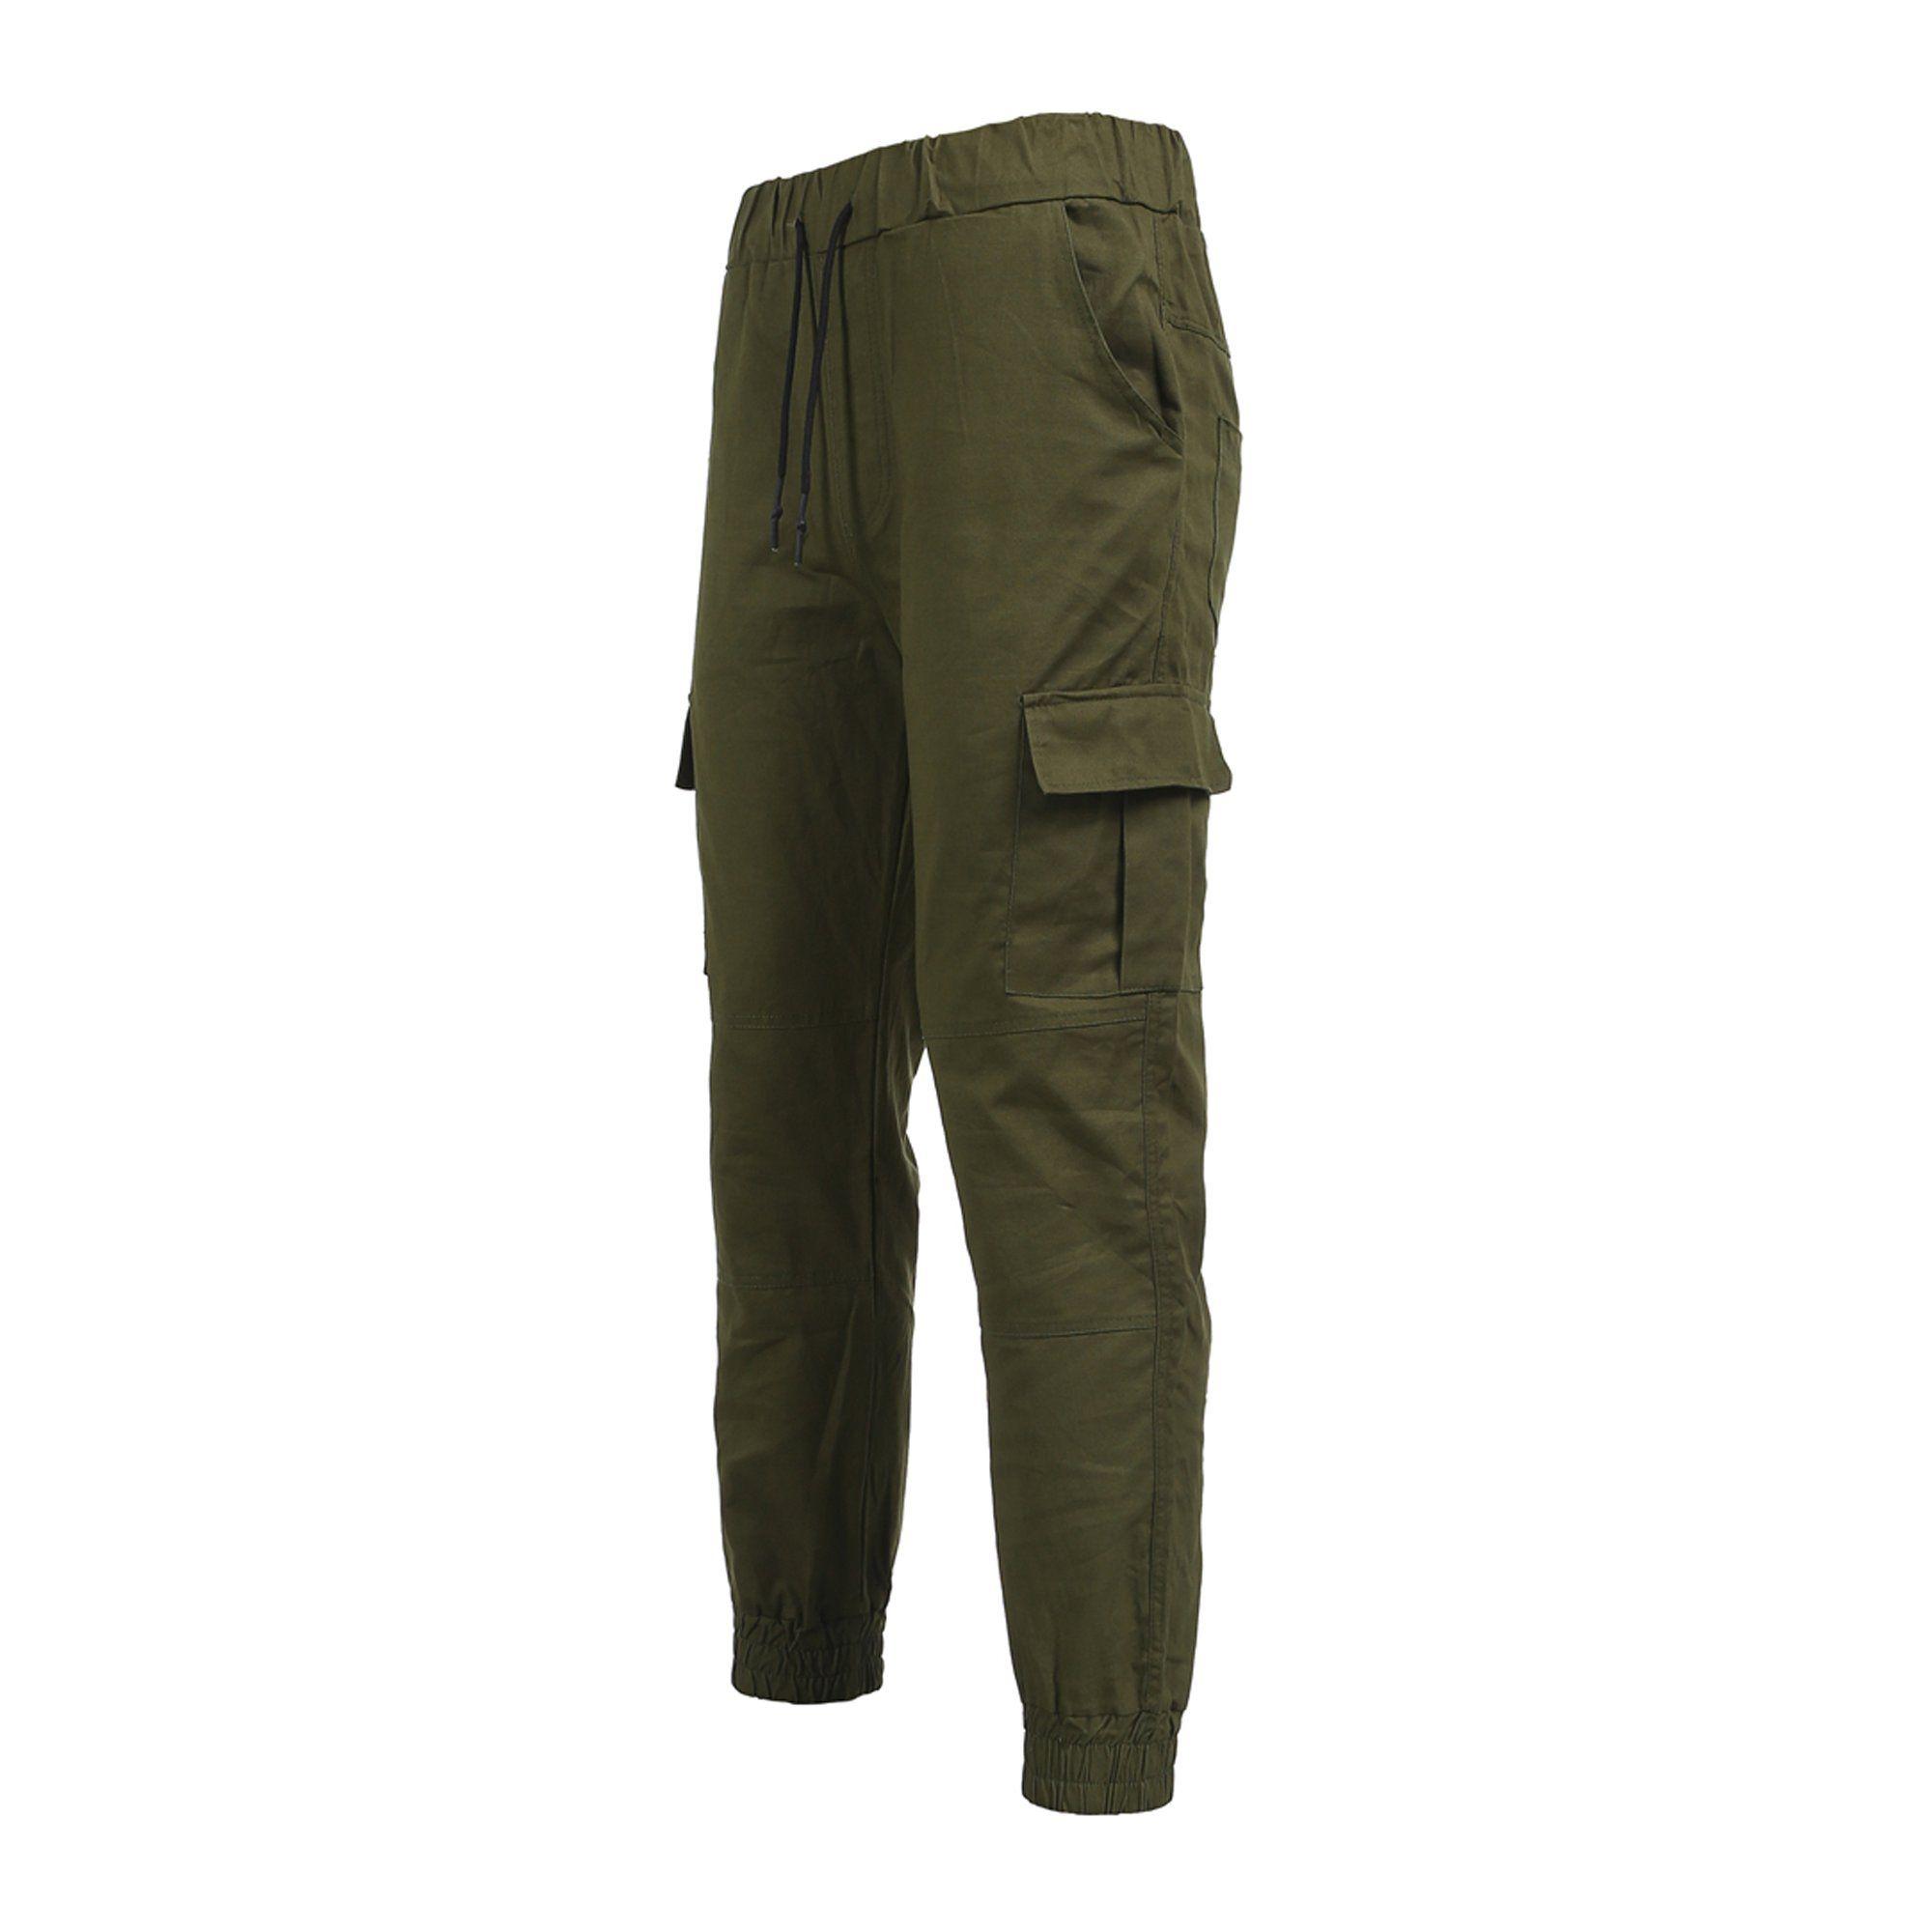 Mersariphy Men Elastic Waist Ankle Tied Cargo Pants Walmart Com Walmart Com Cargo Pants Mens Fashion Wear Pants [ 2000 x 2000 Pixel ]